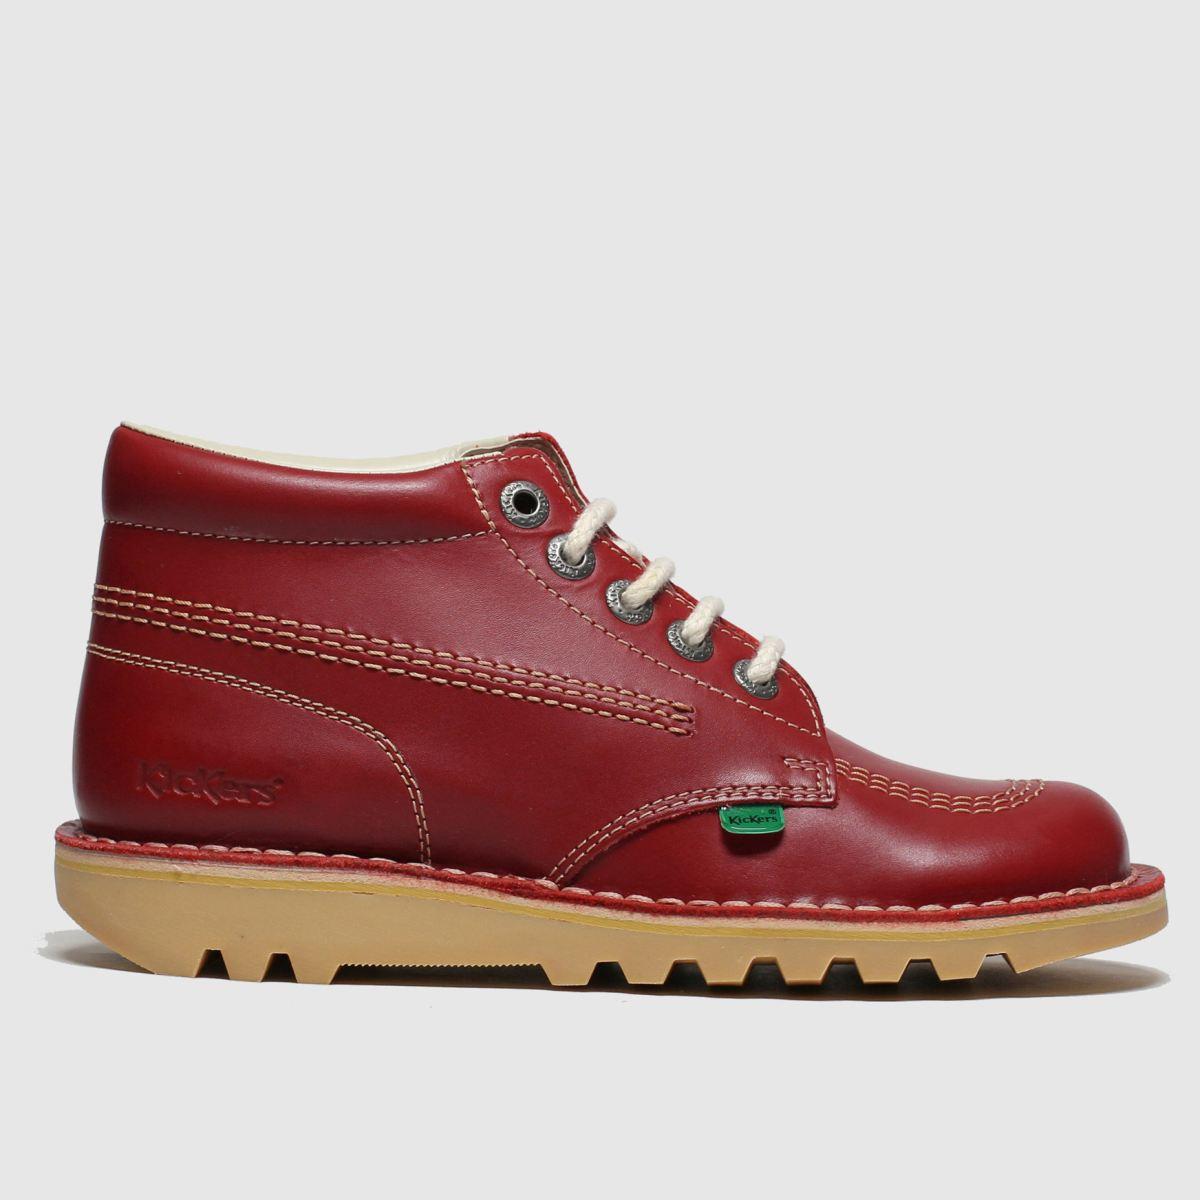 Kickers Red Kick Hi Boots